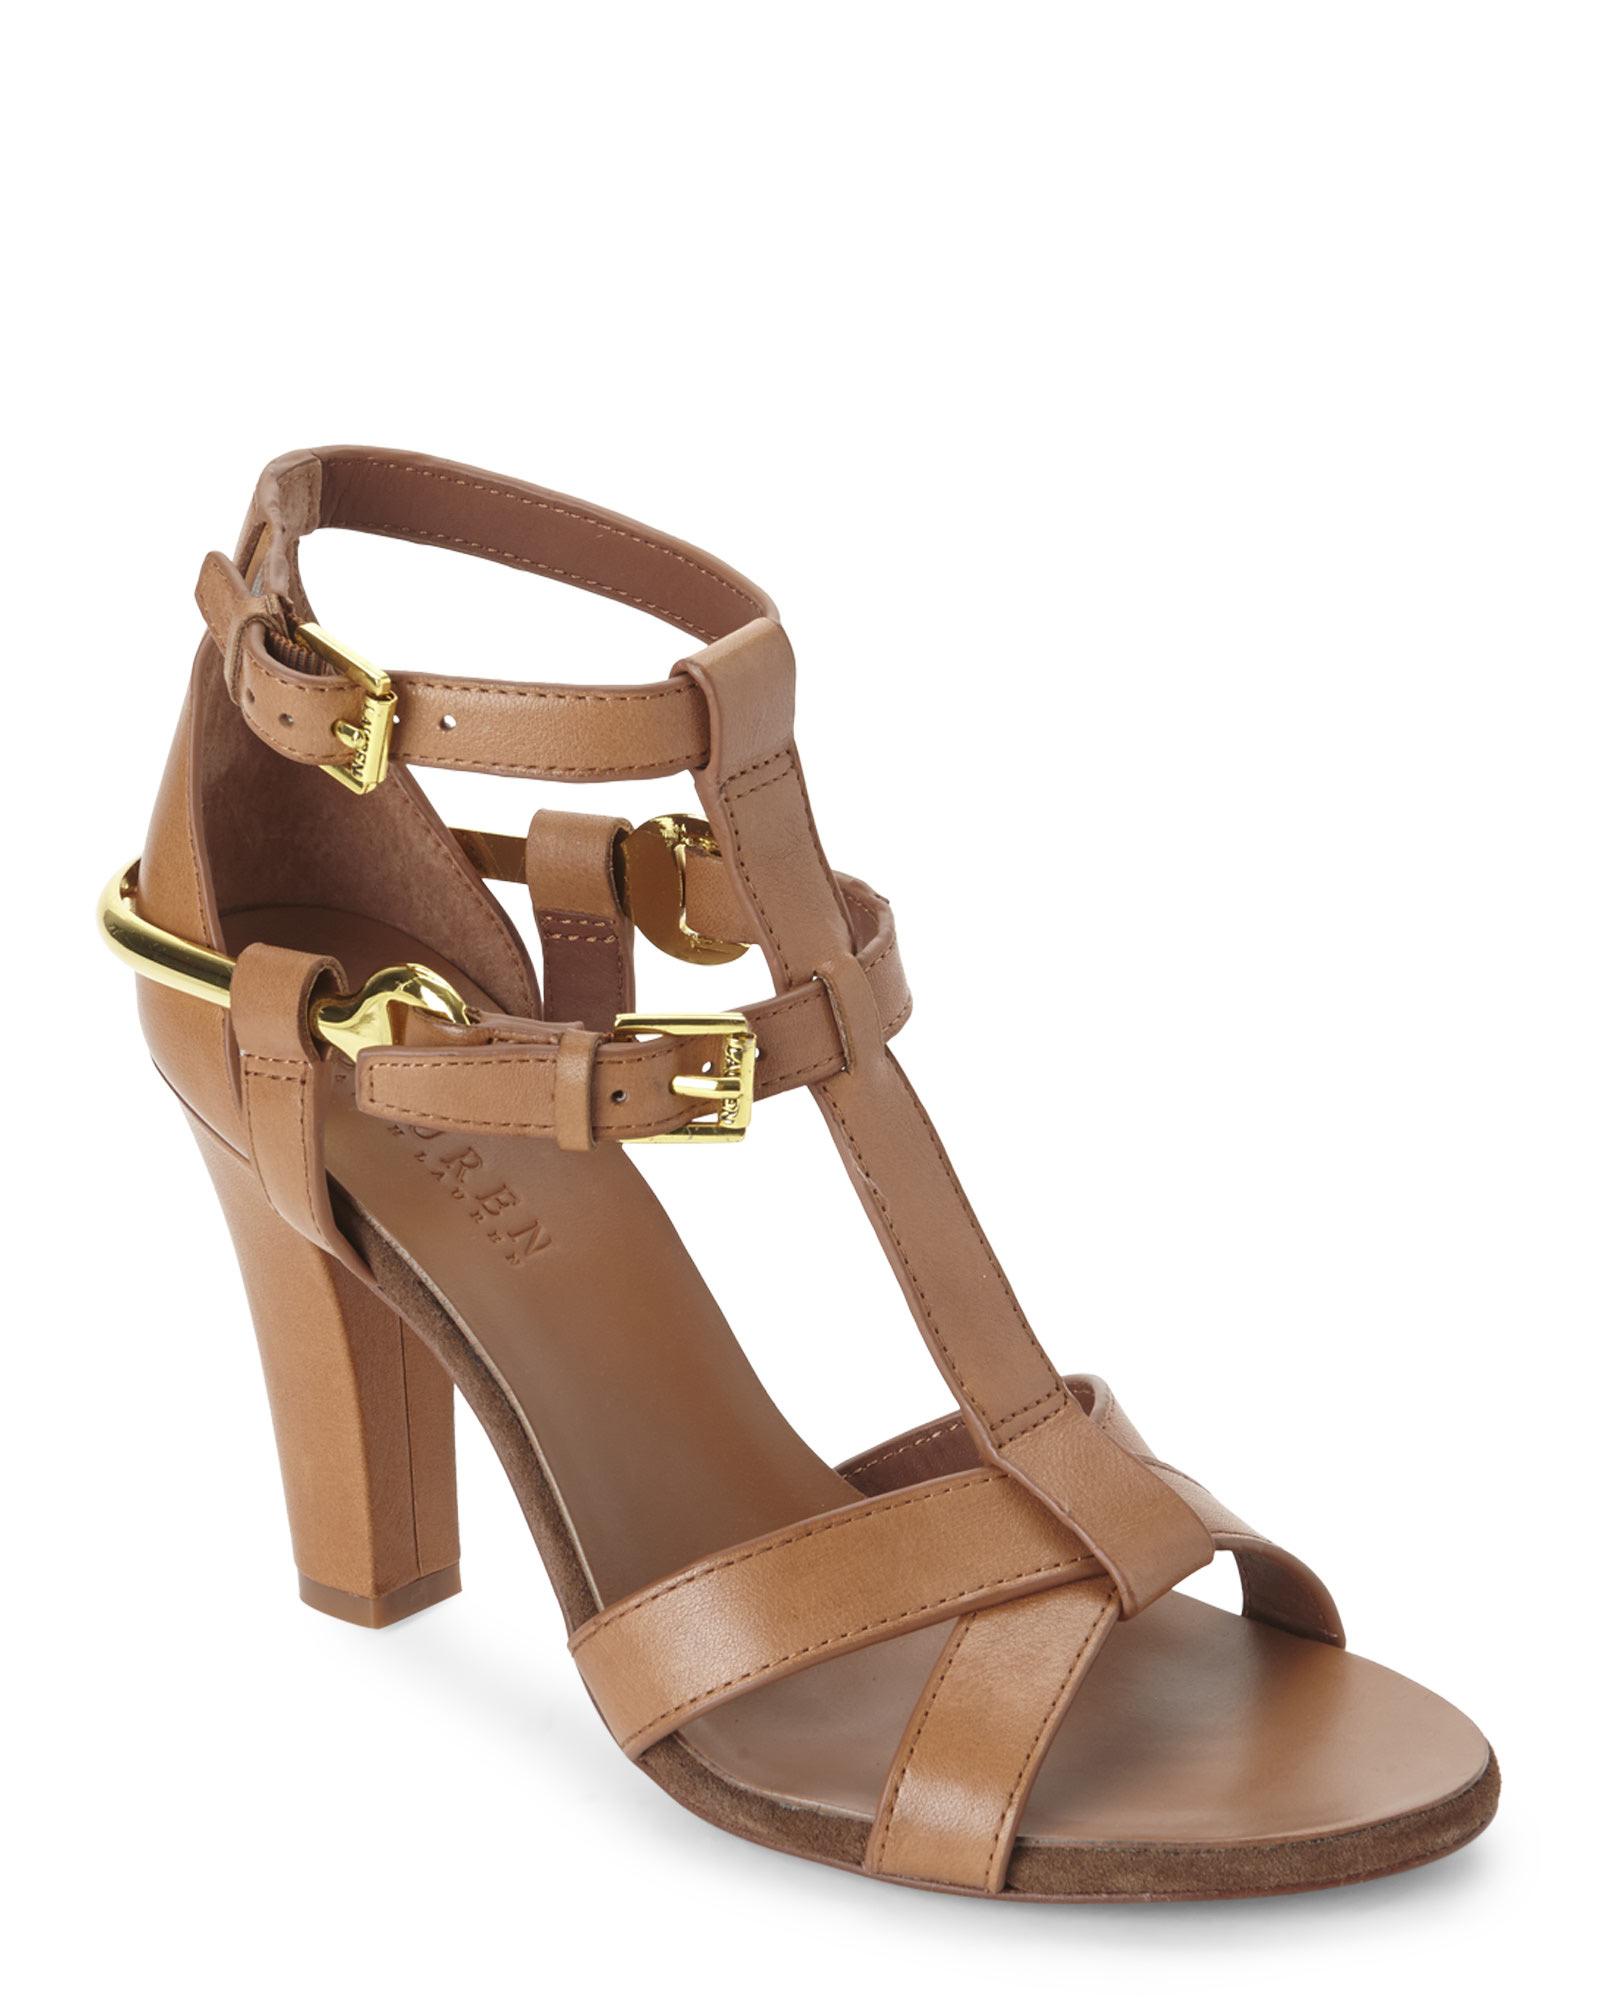 3f98178fef5 Ralph Lauren Brown Tan Leena Vachetta Leather Sandals